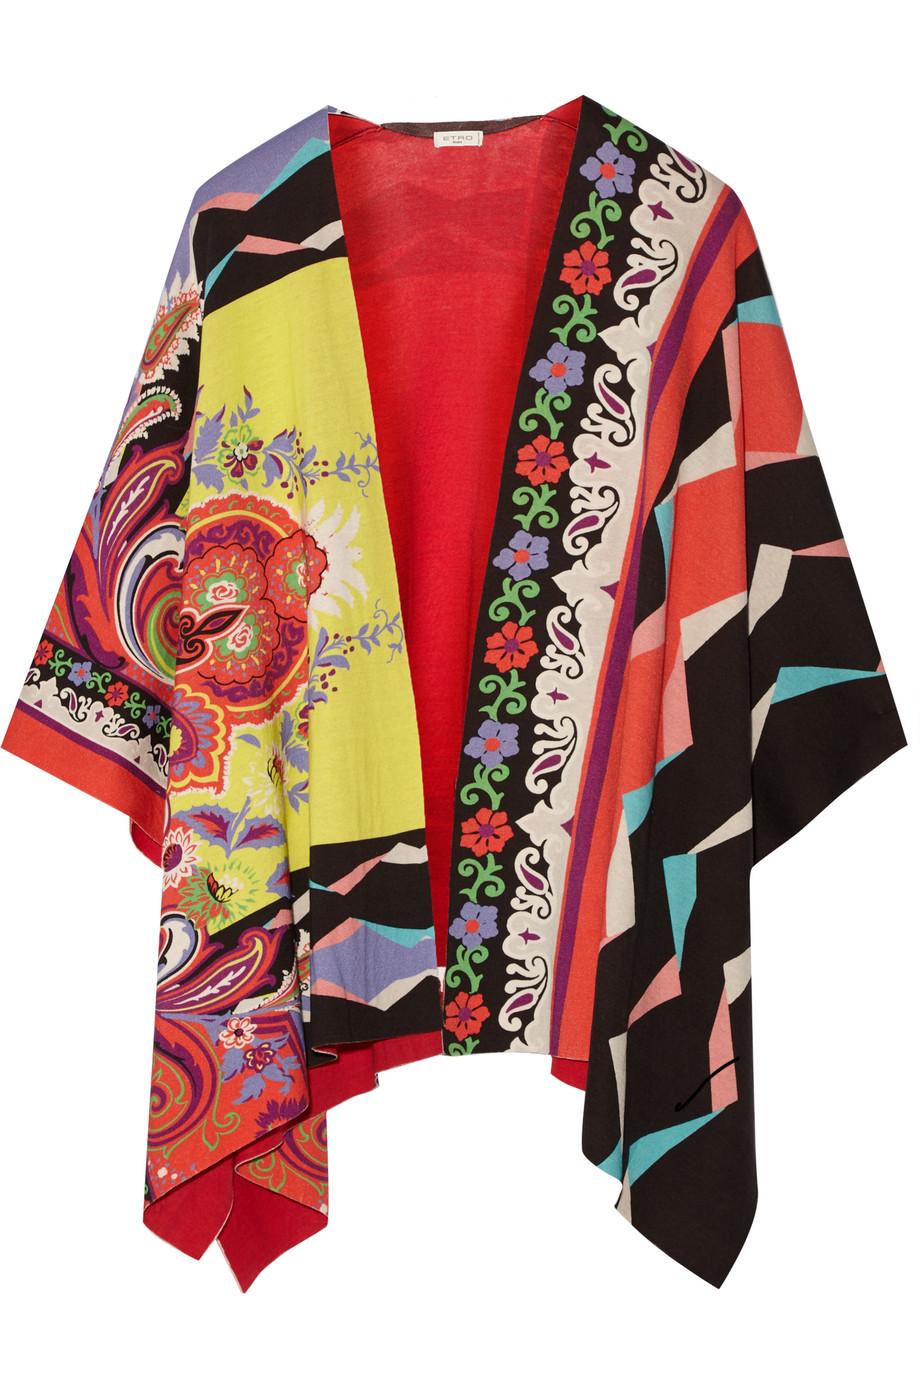 Etro Cotton-Jacquard Poncho, Red, Women's